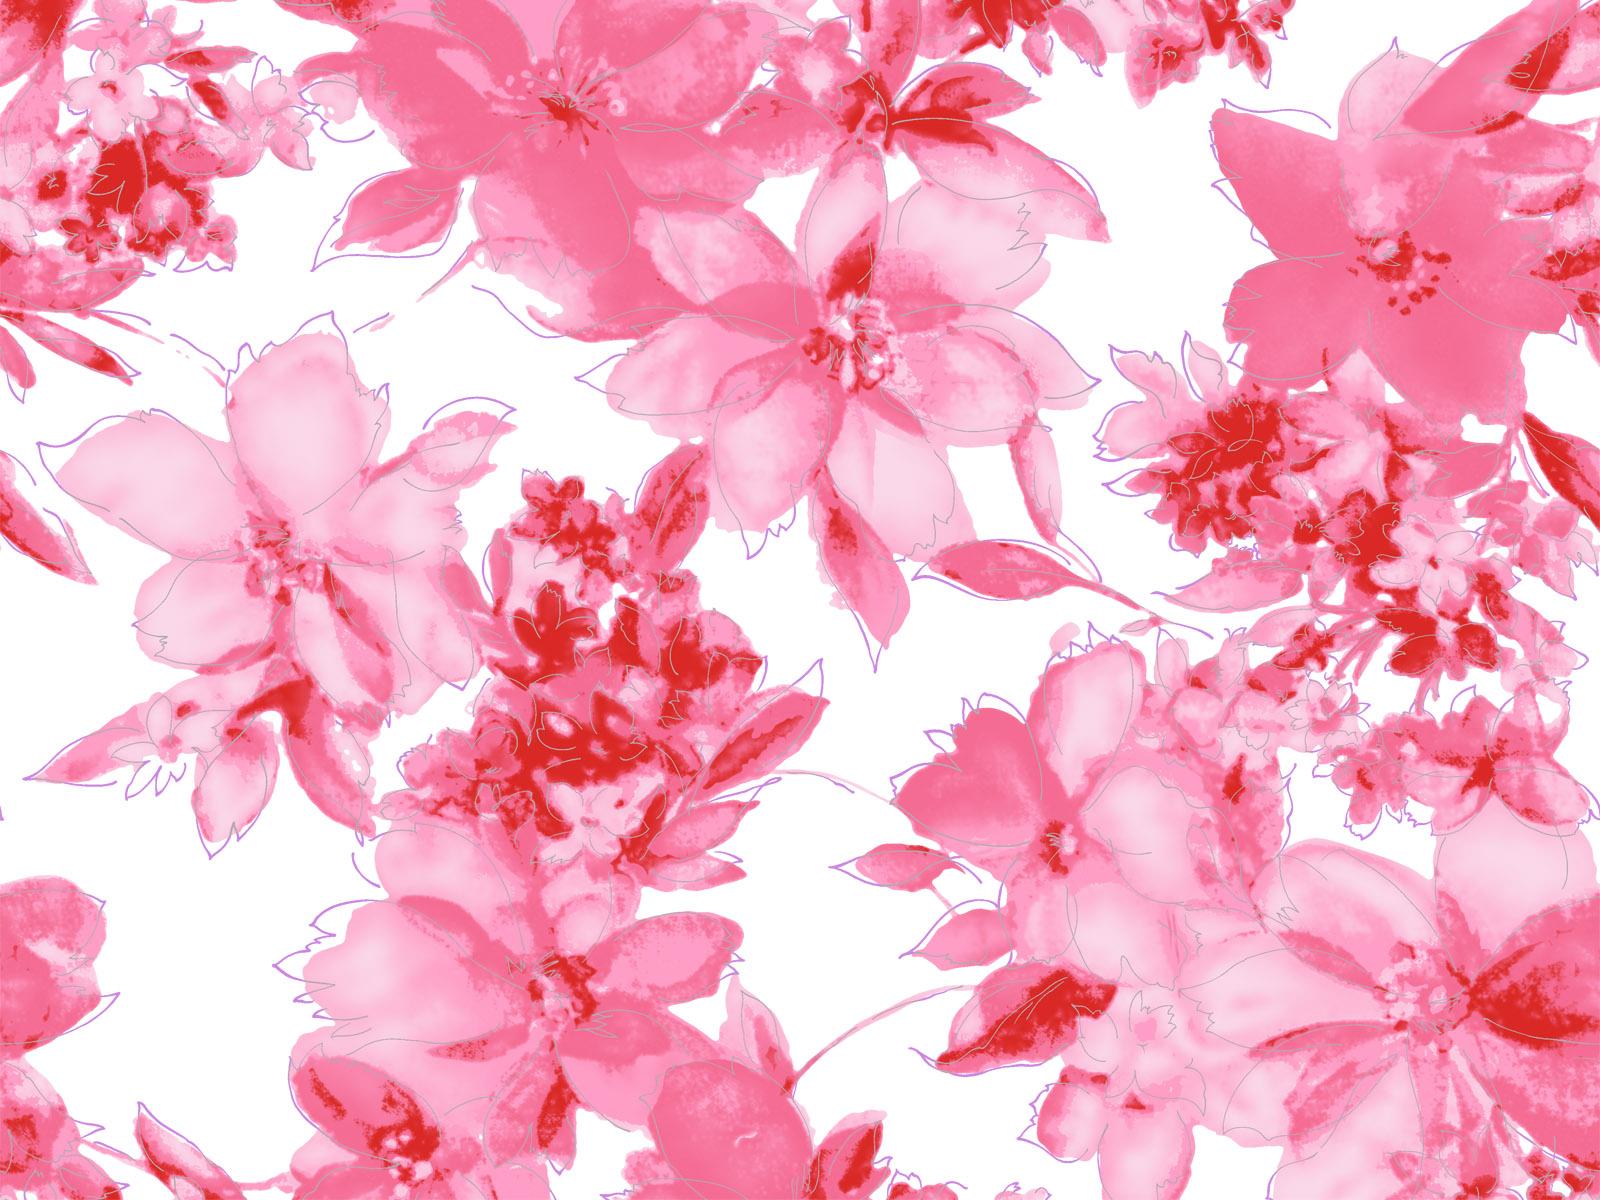 Flowers Wallpaper Glow Beautiful Rosses 1600x1200